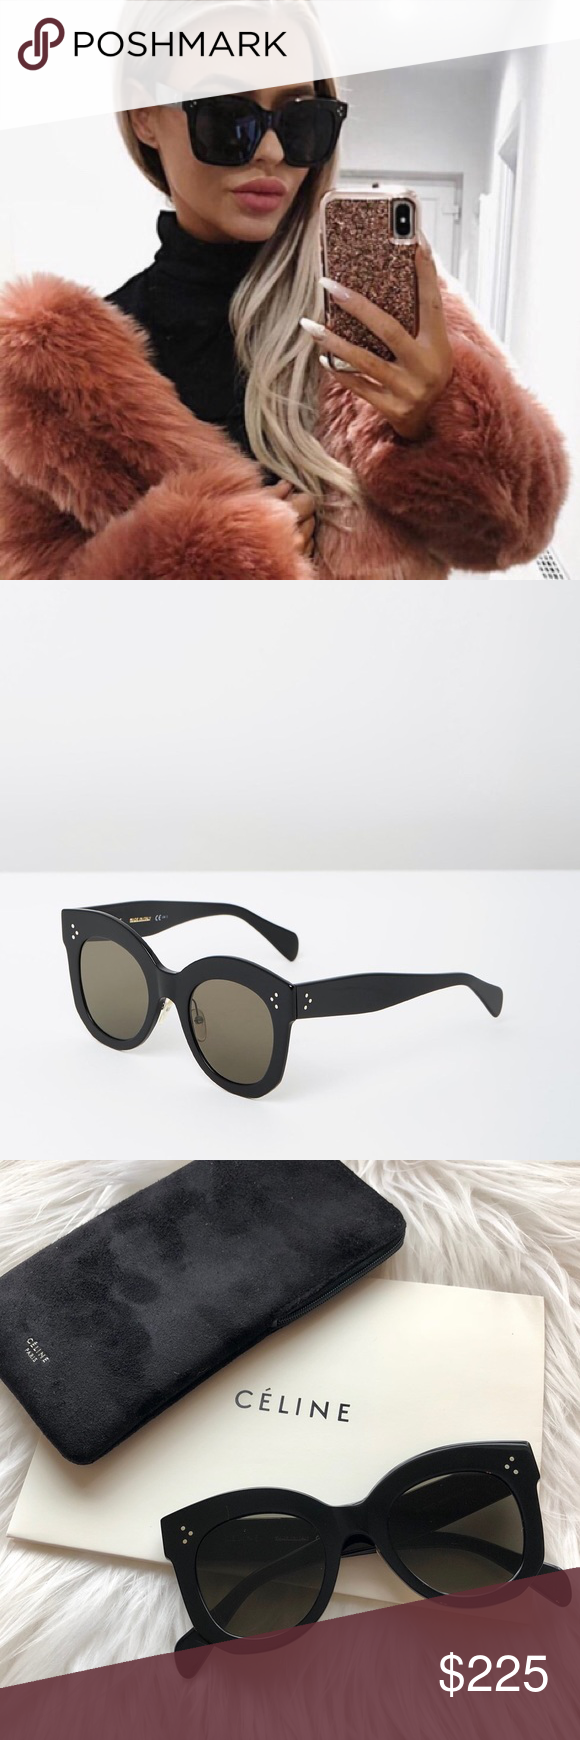 b1b3ef16c6c1d NEW    Céline CL 41443 Chris Sunglasses Authentic Céline CL 41443 S 06Z Chris  Round Sunglasses. 50-24-155mm. Black acetate frame with grey lenses.